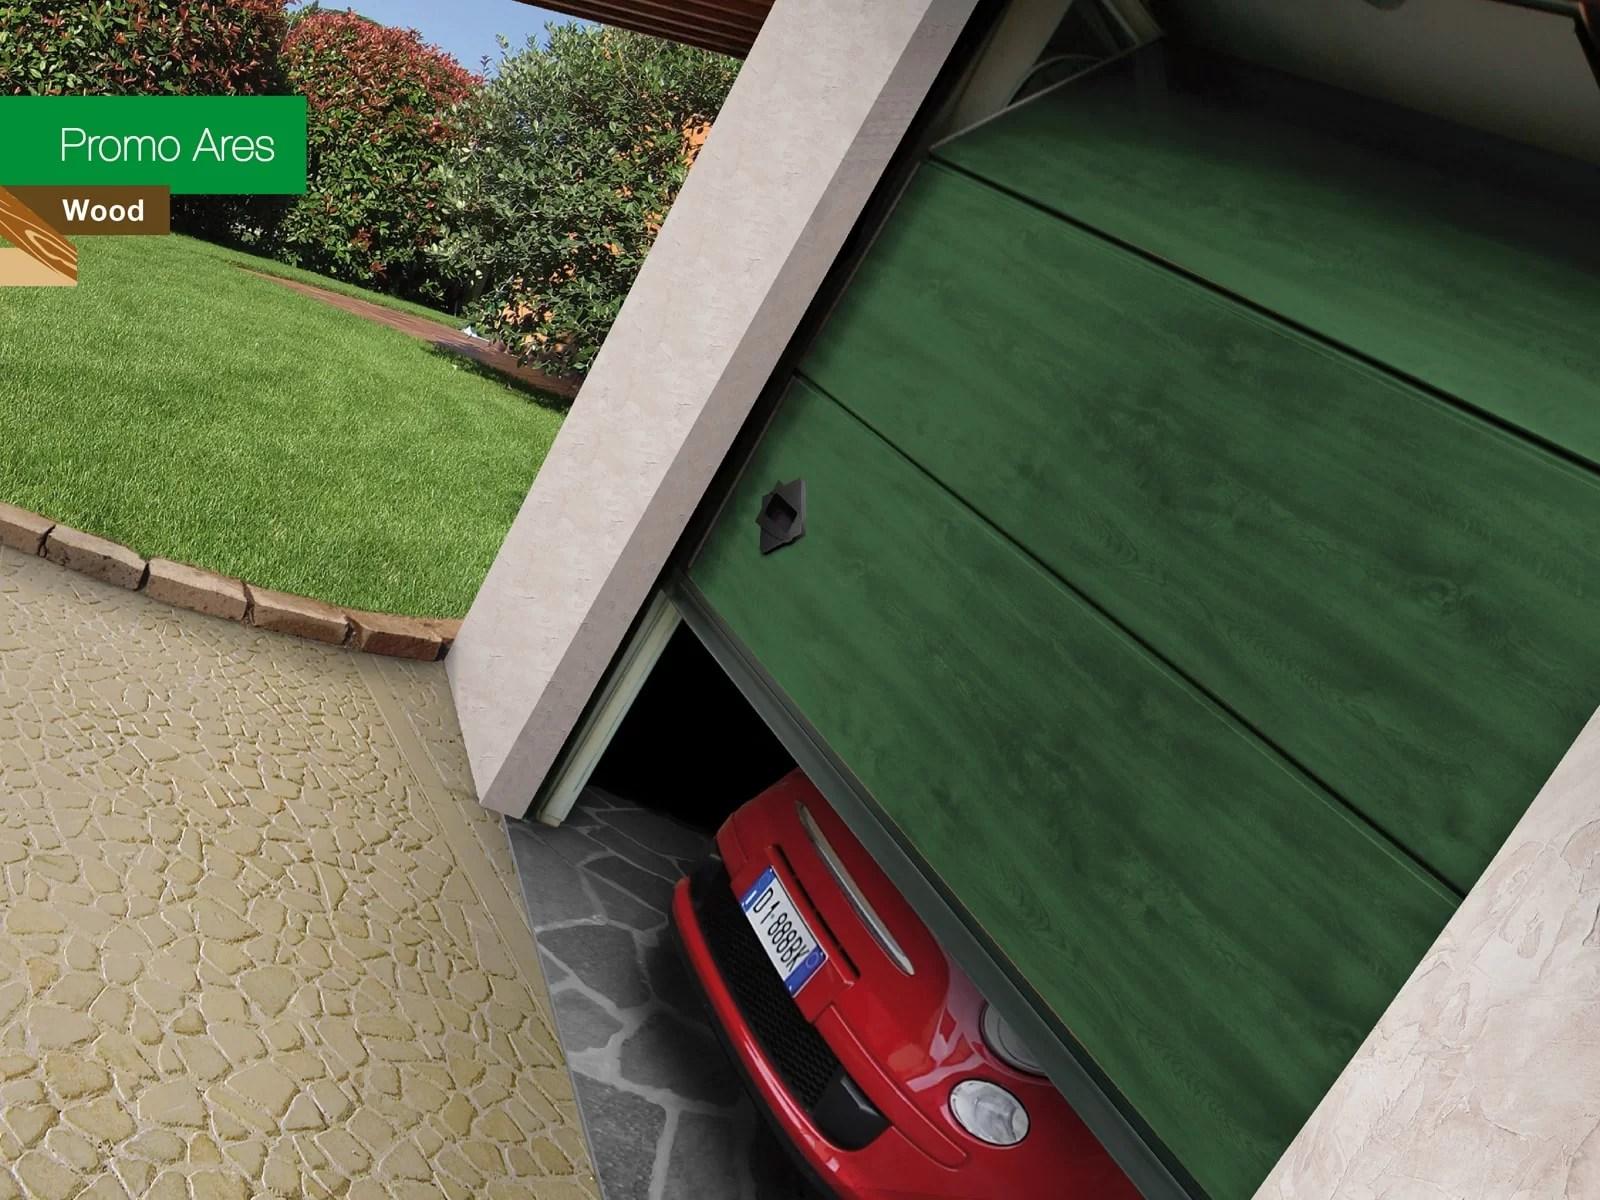 Rigatino Verde – Flat